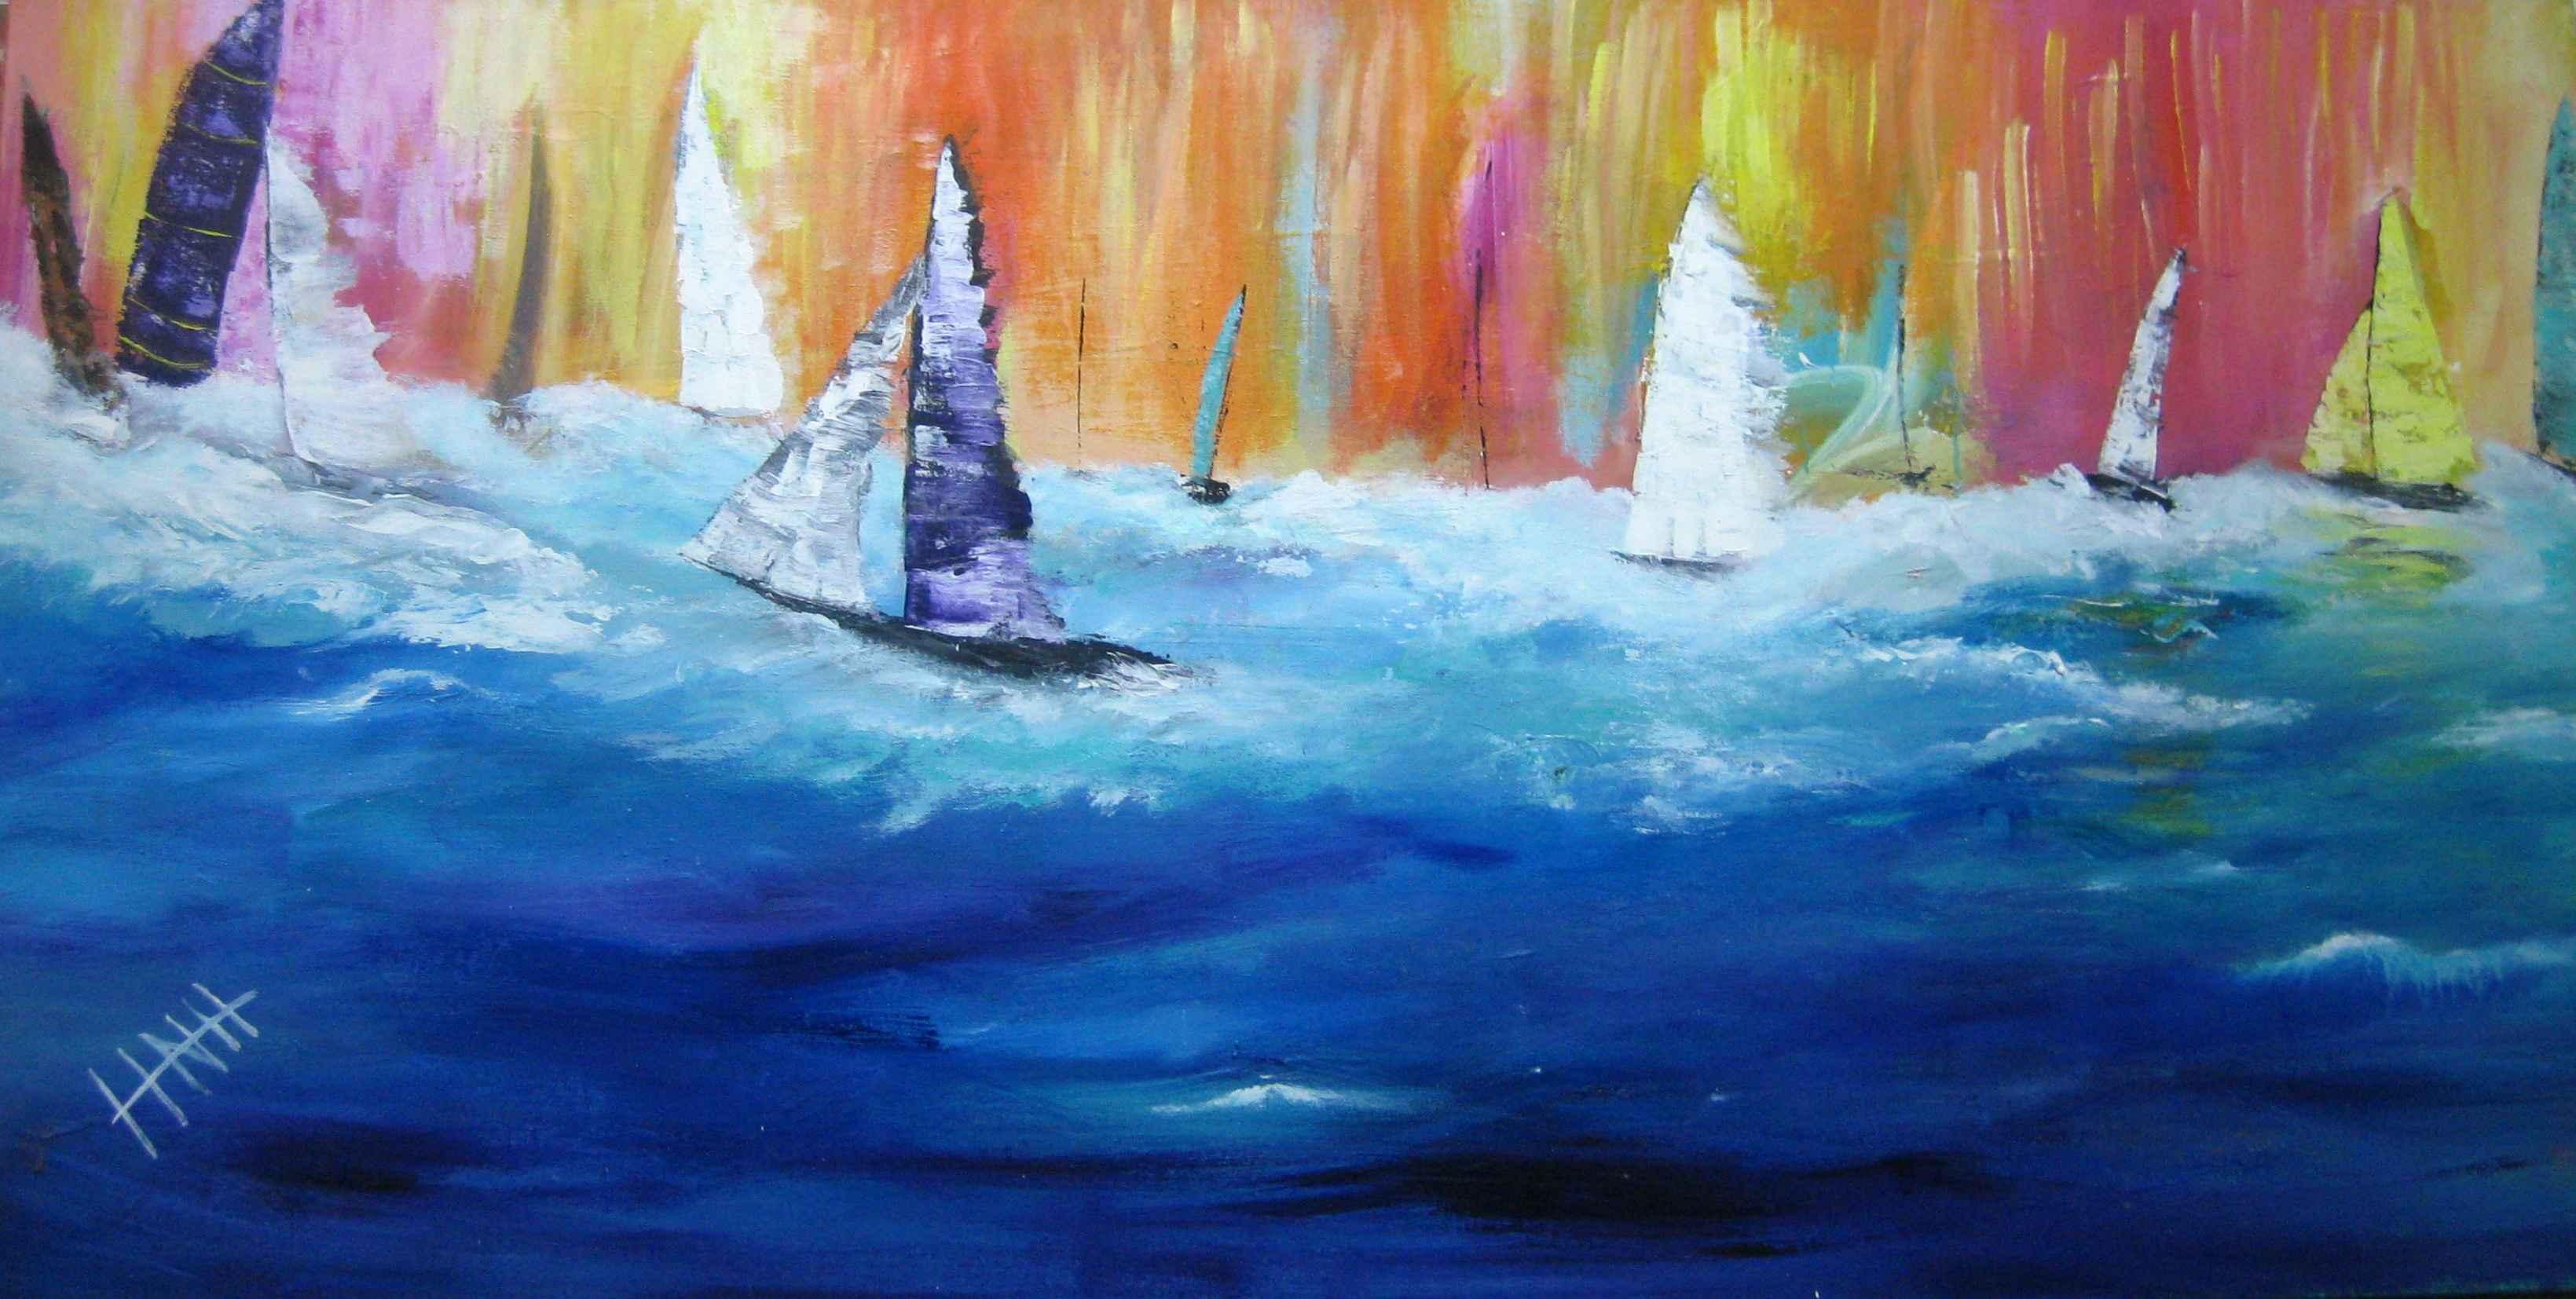 310 Sailing in Paradi... by Mr Nicholas Hadeed - Masterpiece Online